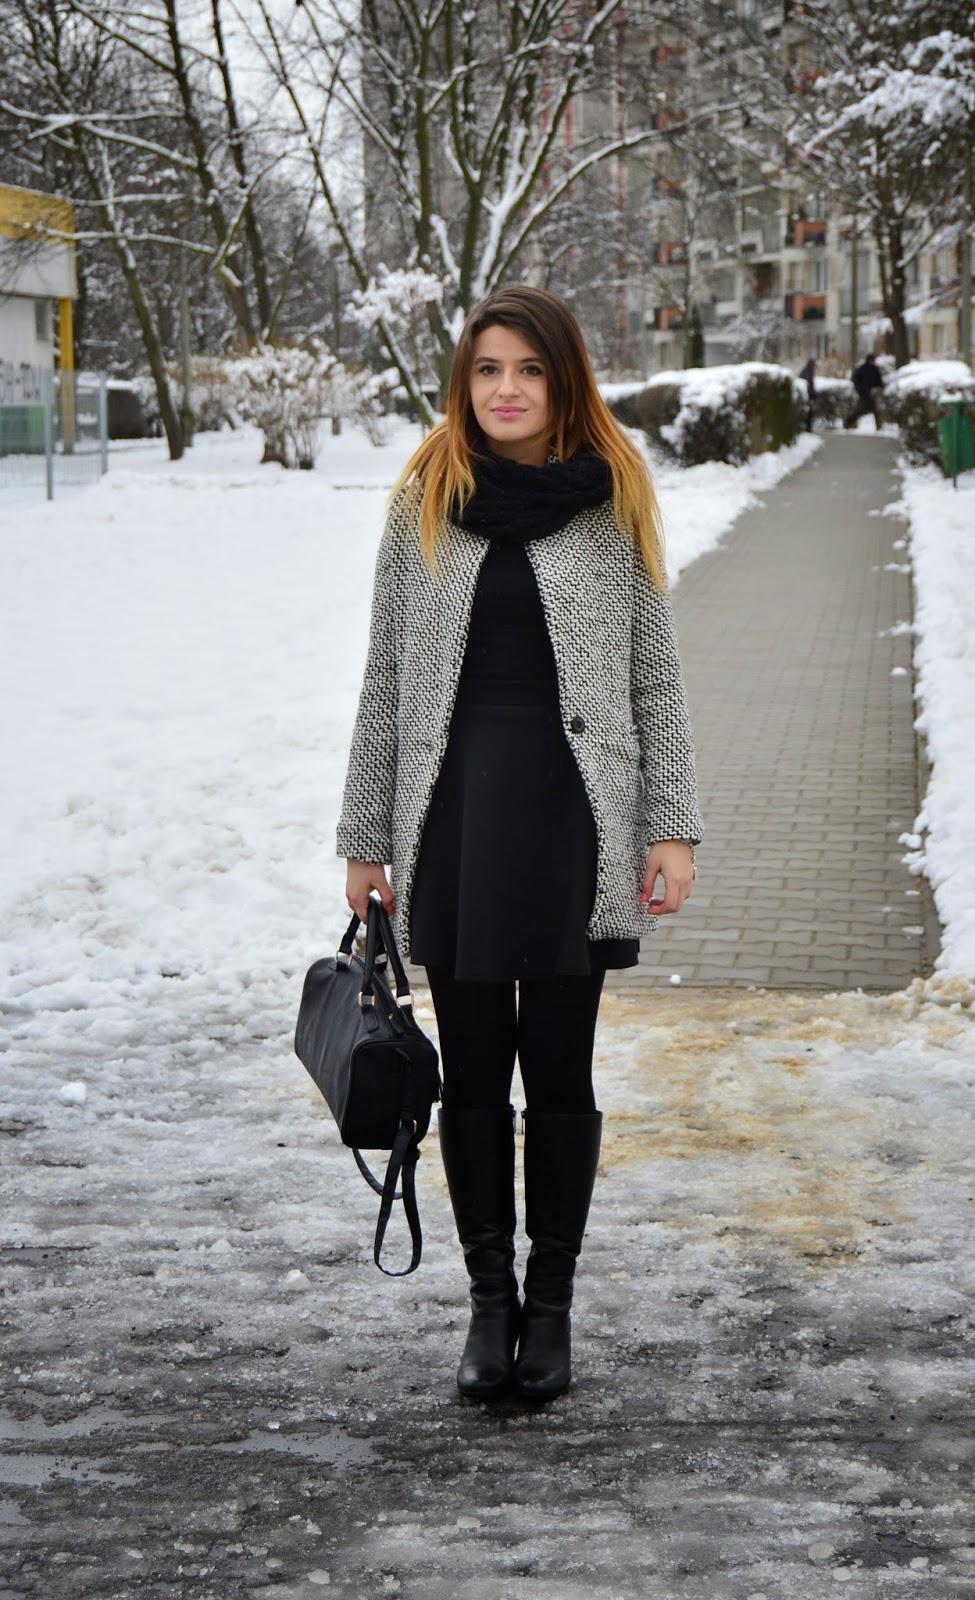 http://www.sheinside.com/Black-White-Notch-Stand-Collar-Long-Sleeve-Oversize-Coat-p-144640-cat-1735.html?utm_source=kasjaa.blogspot.com&utm_medium=blogger&url_from=kasjaa